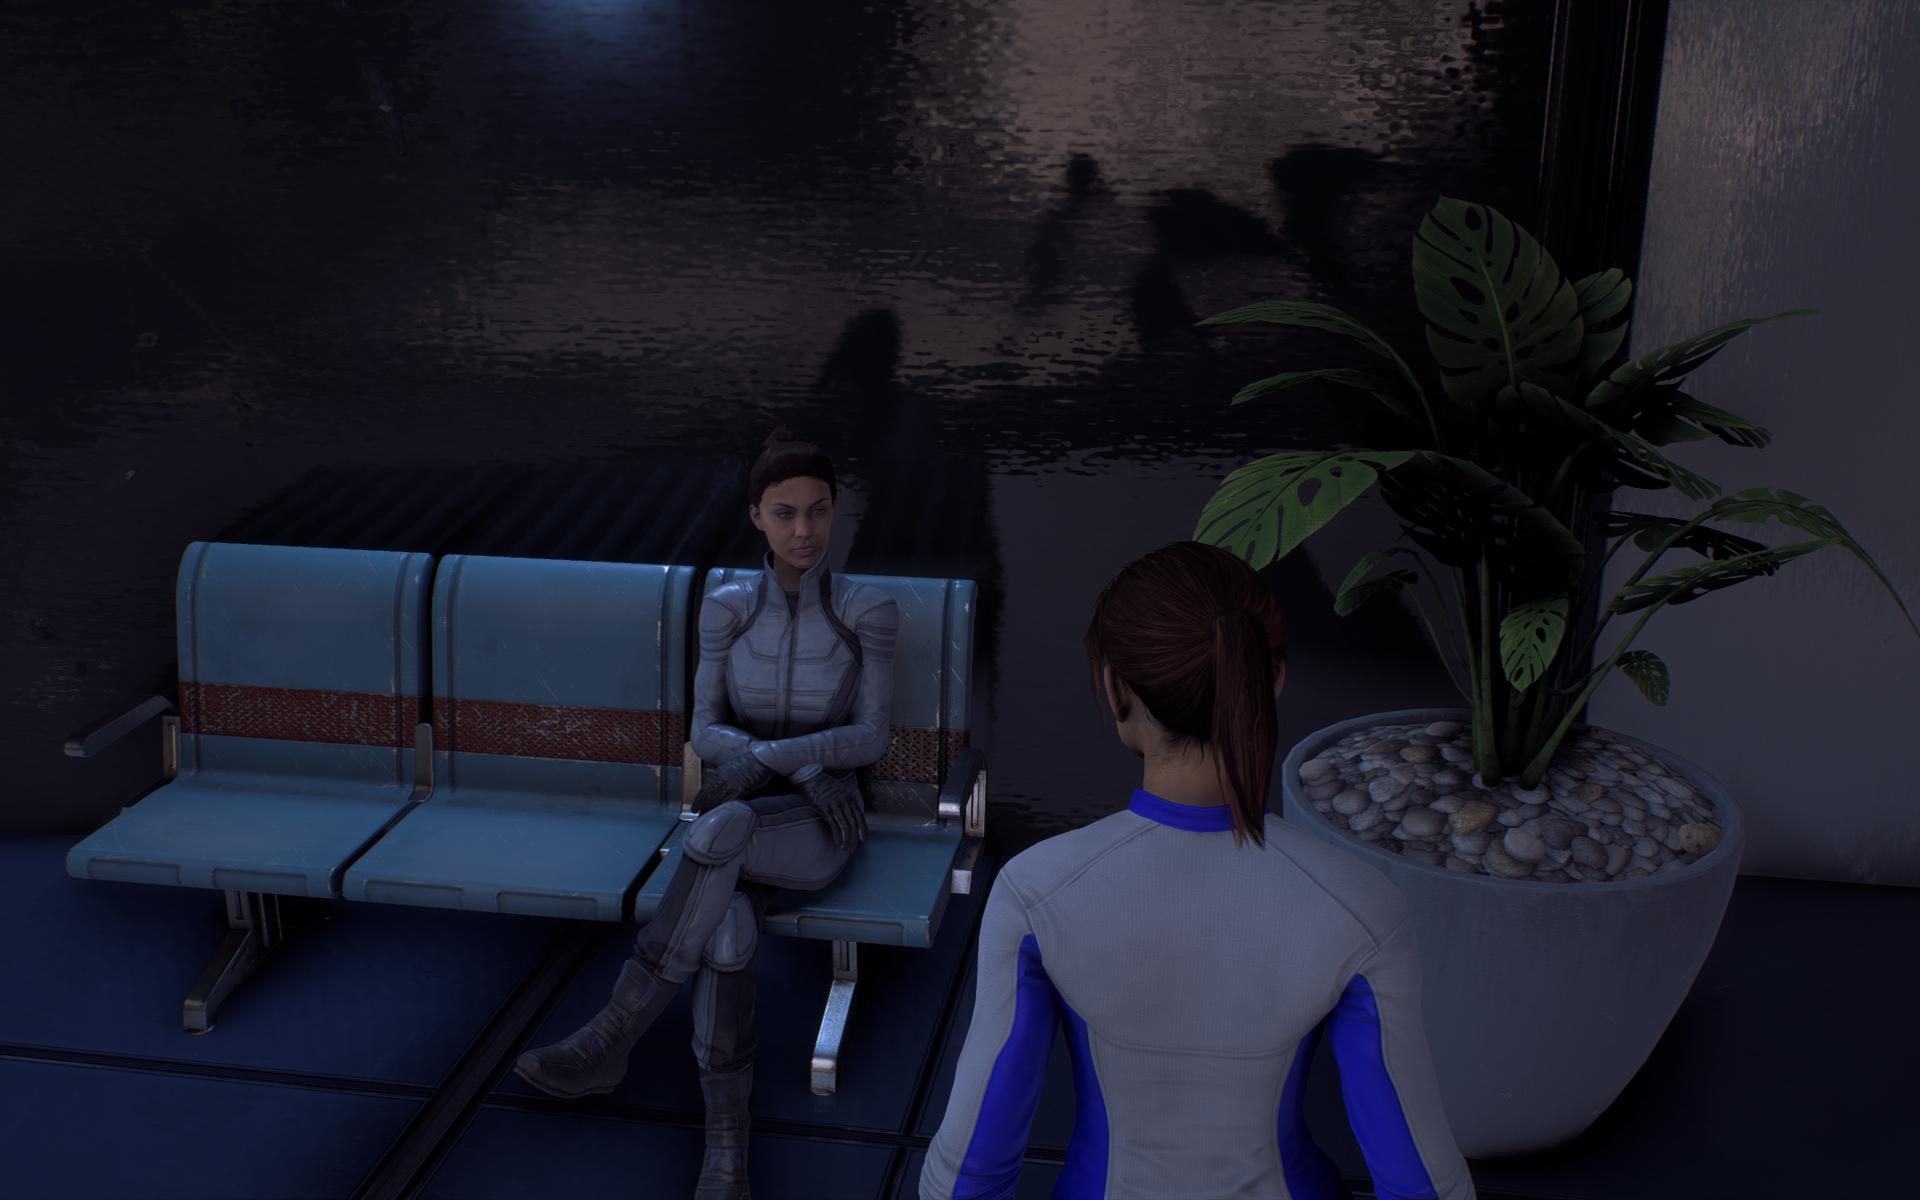 Mass Effect Andromeda Screenshot  - 10.19.16.33.png - Mass Effect: Andromeda